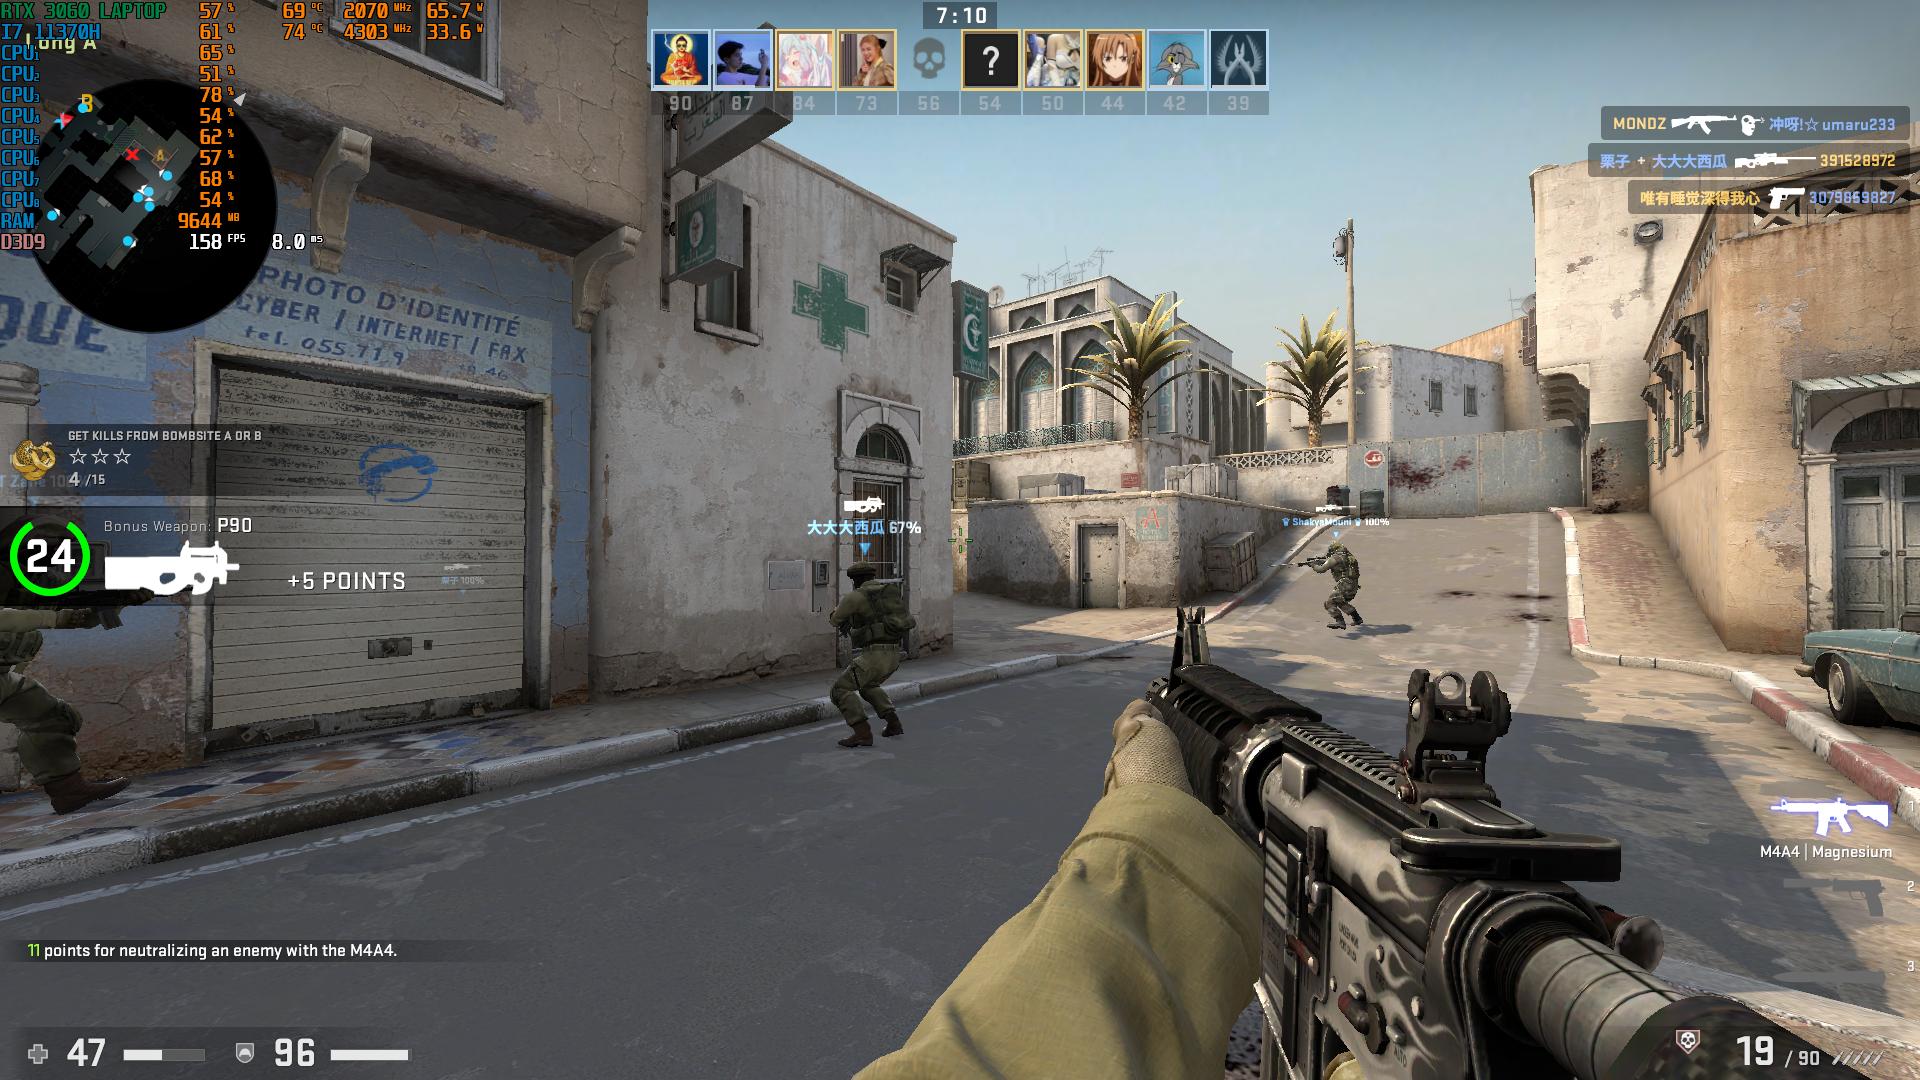 counter-strike-global-offensive-screenshot-2021-04-06-02-48-10-18-png.13435